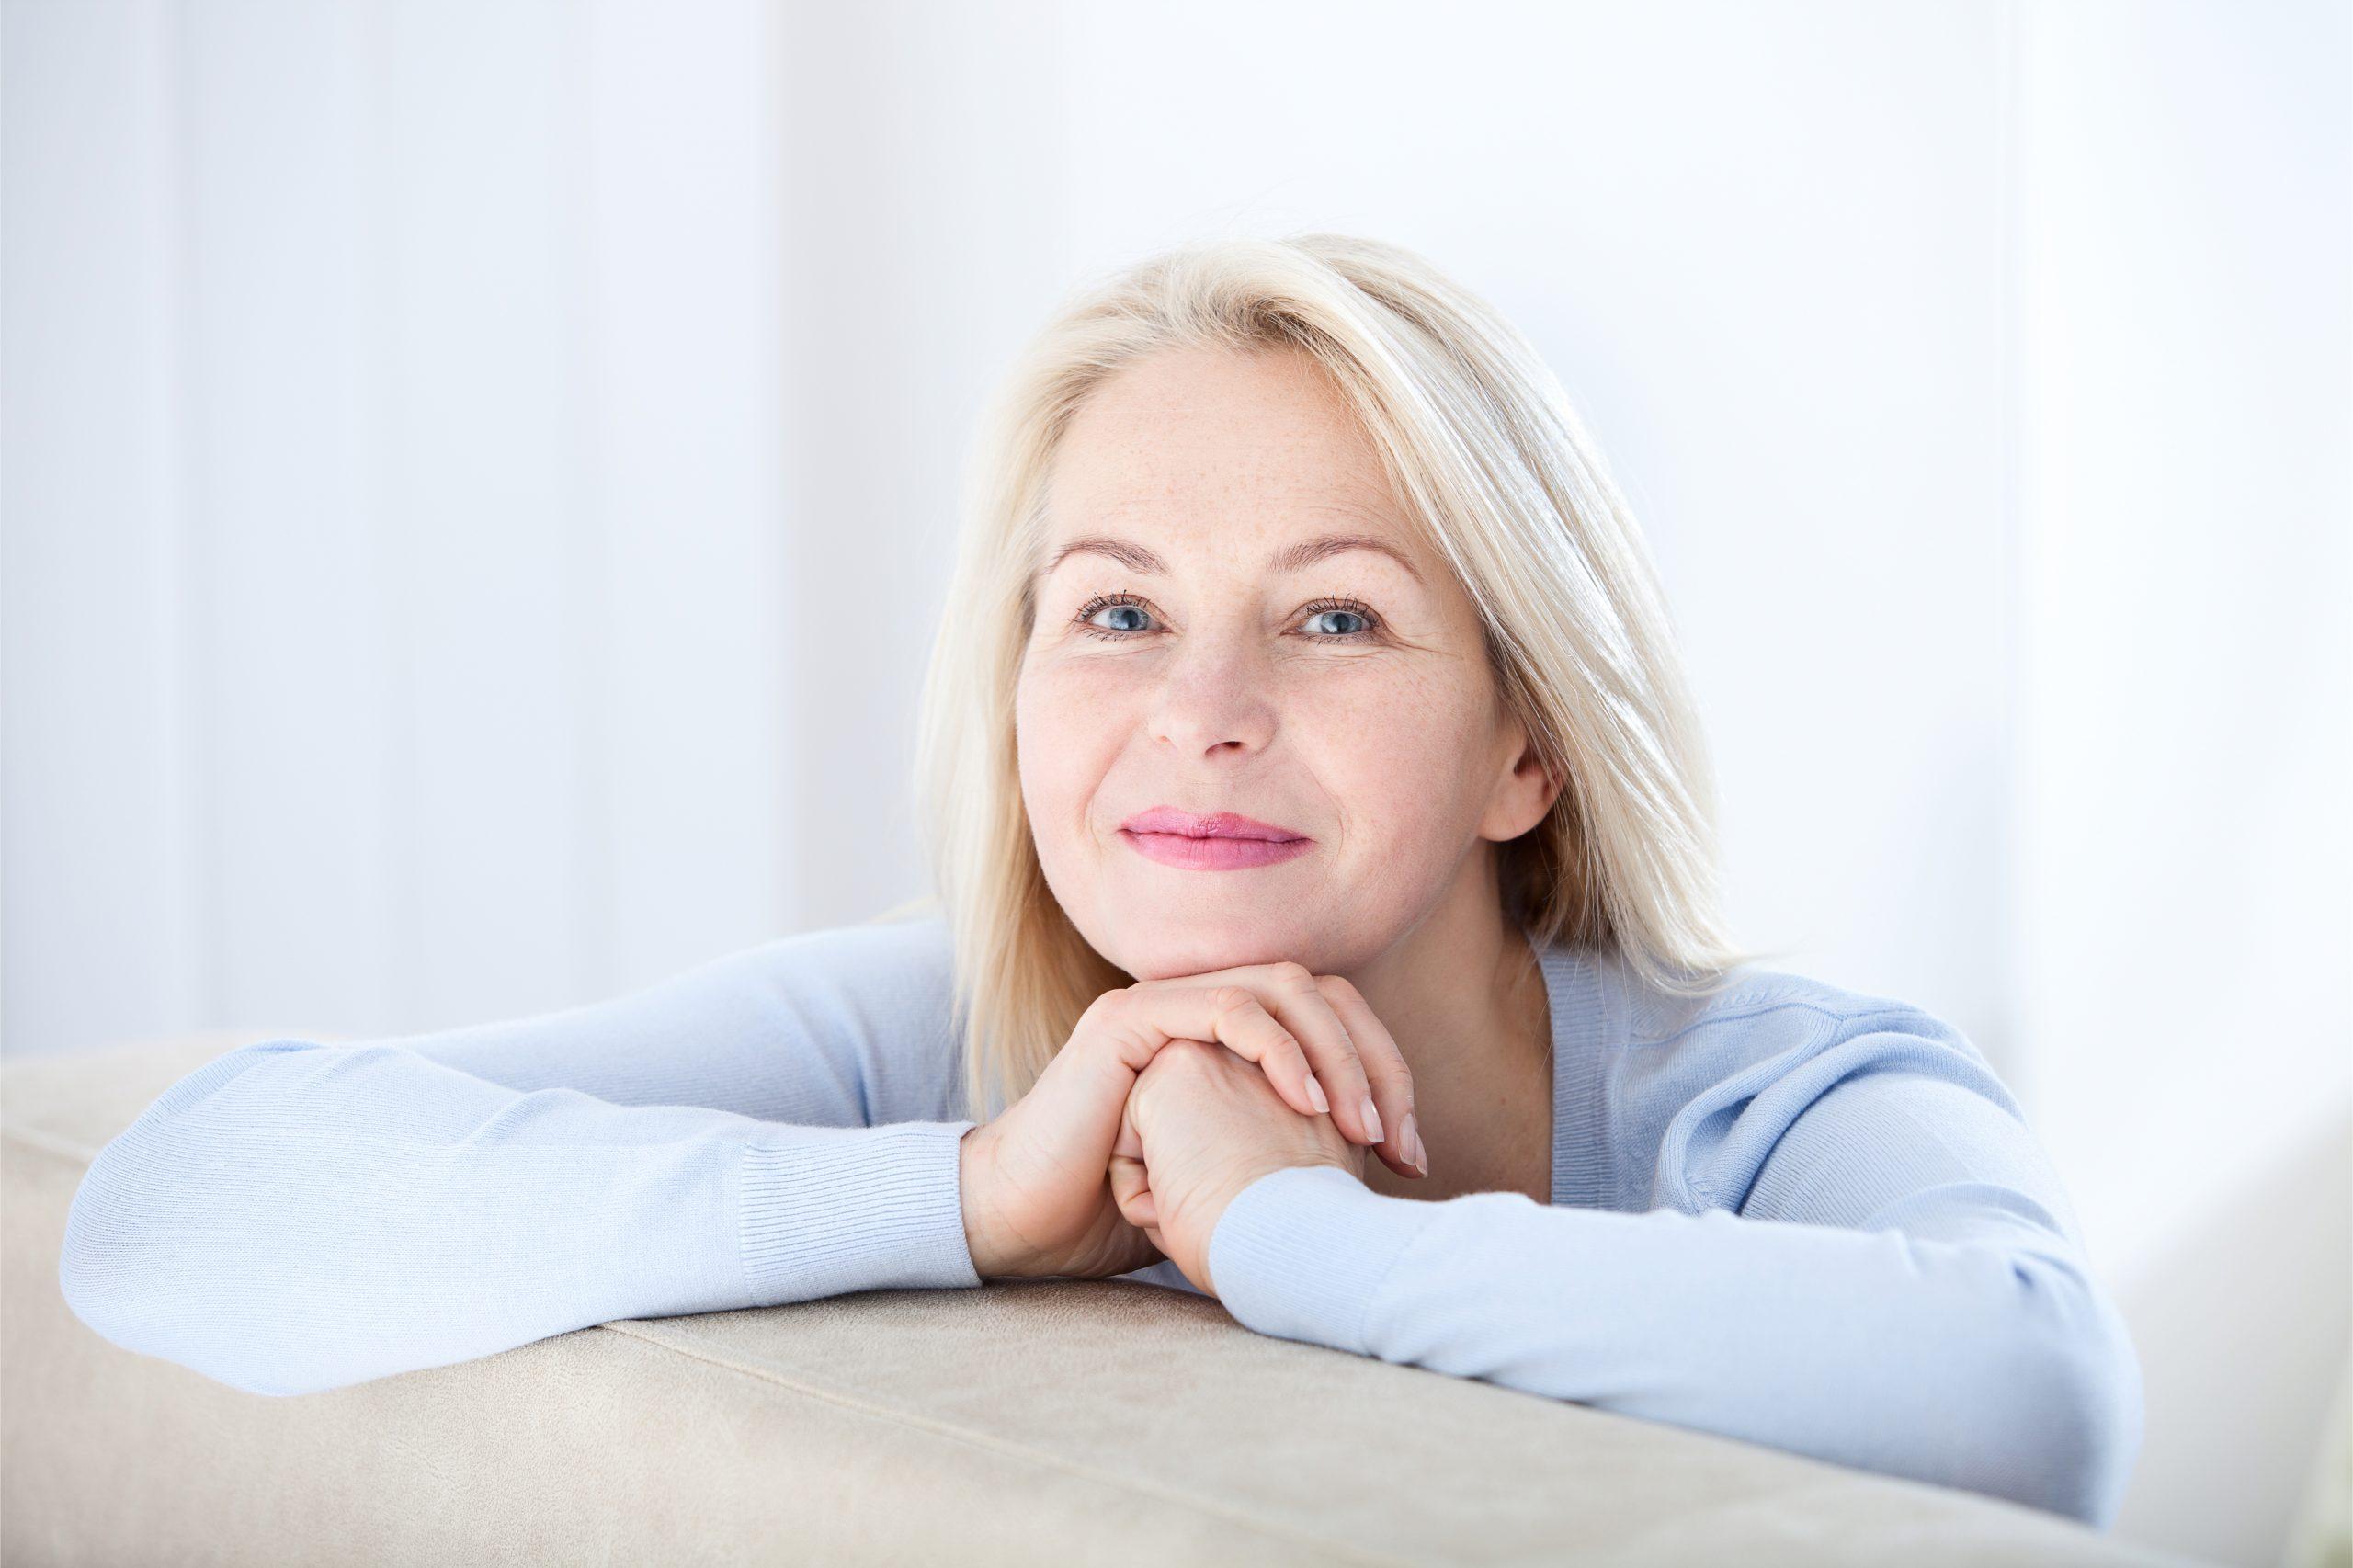 mujer menopausia sequedad